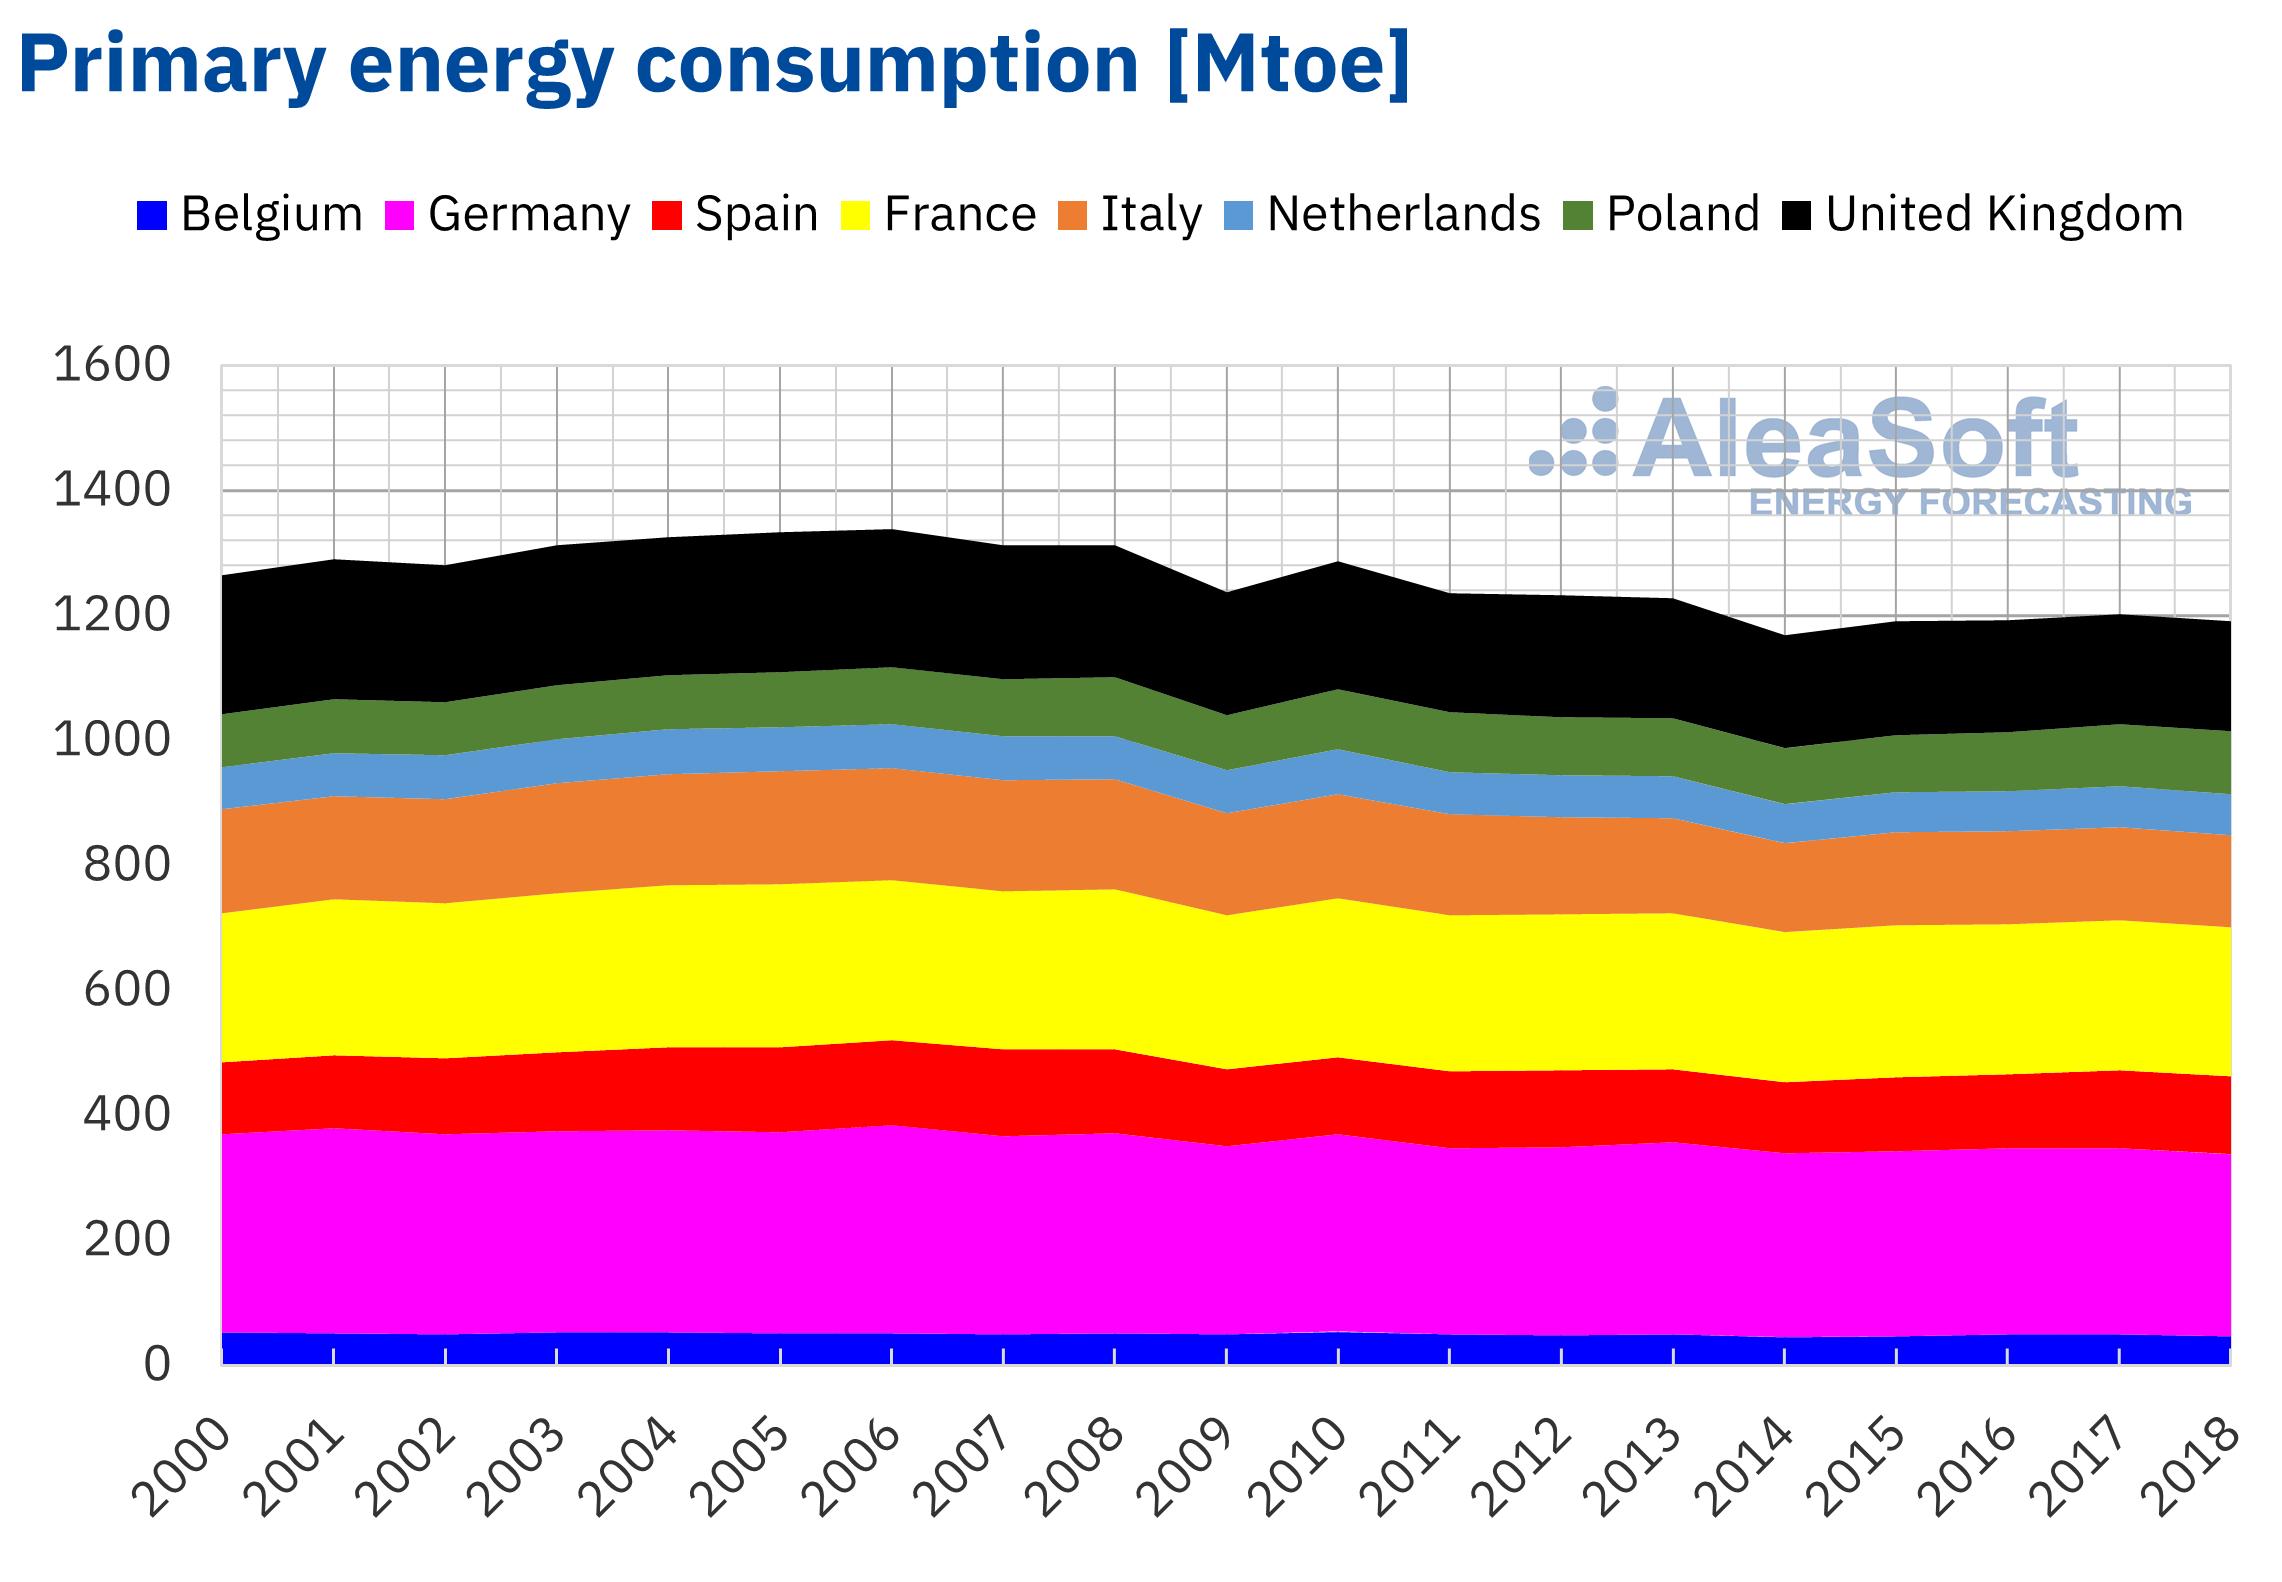 AleaSoft - Primary energy consumption Europe